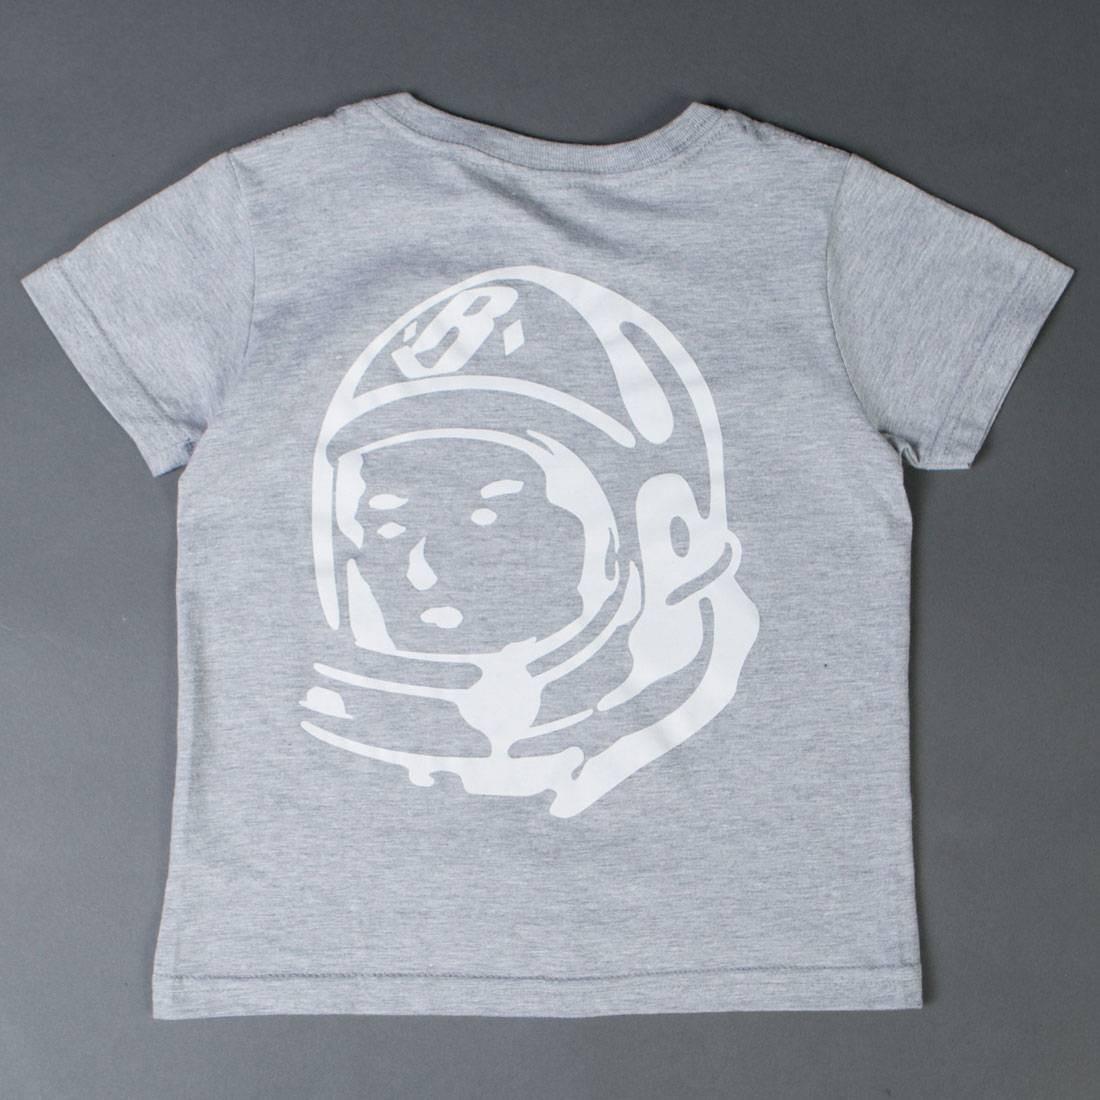 Billionaire Boys Club Youth Arch Helmet Tee (gray / heather)